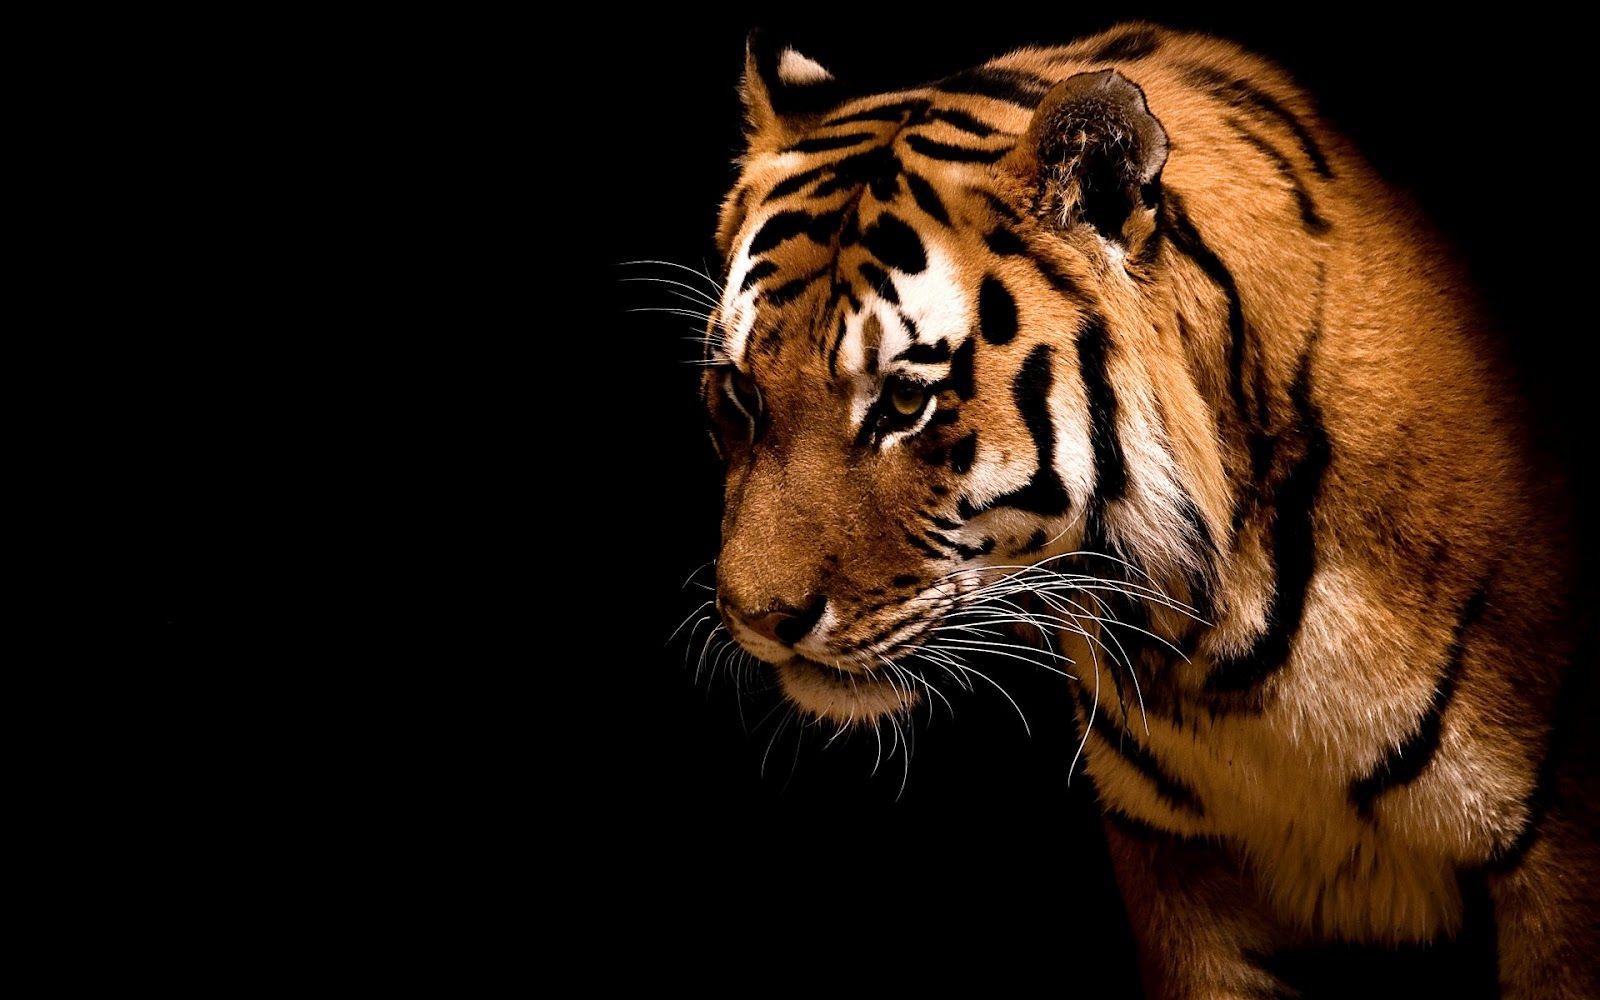 Wallpapers hd desktop wallpapers free amazing wallpapers of tigers